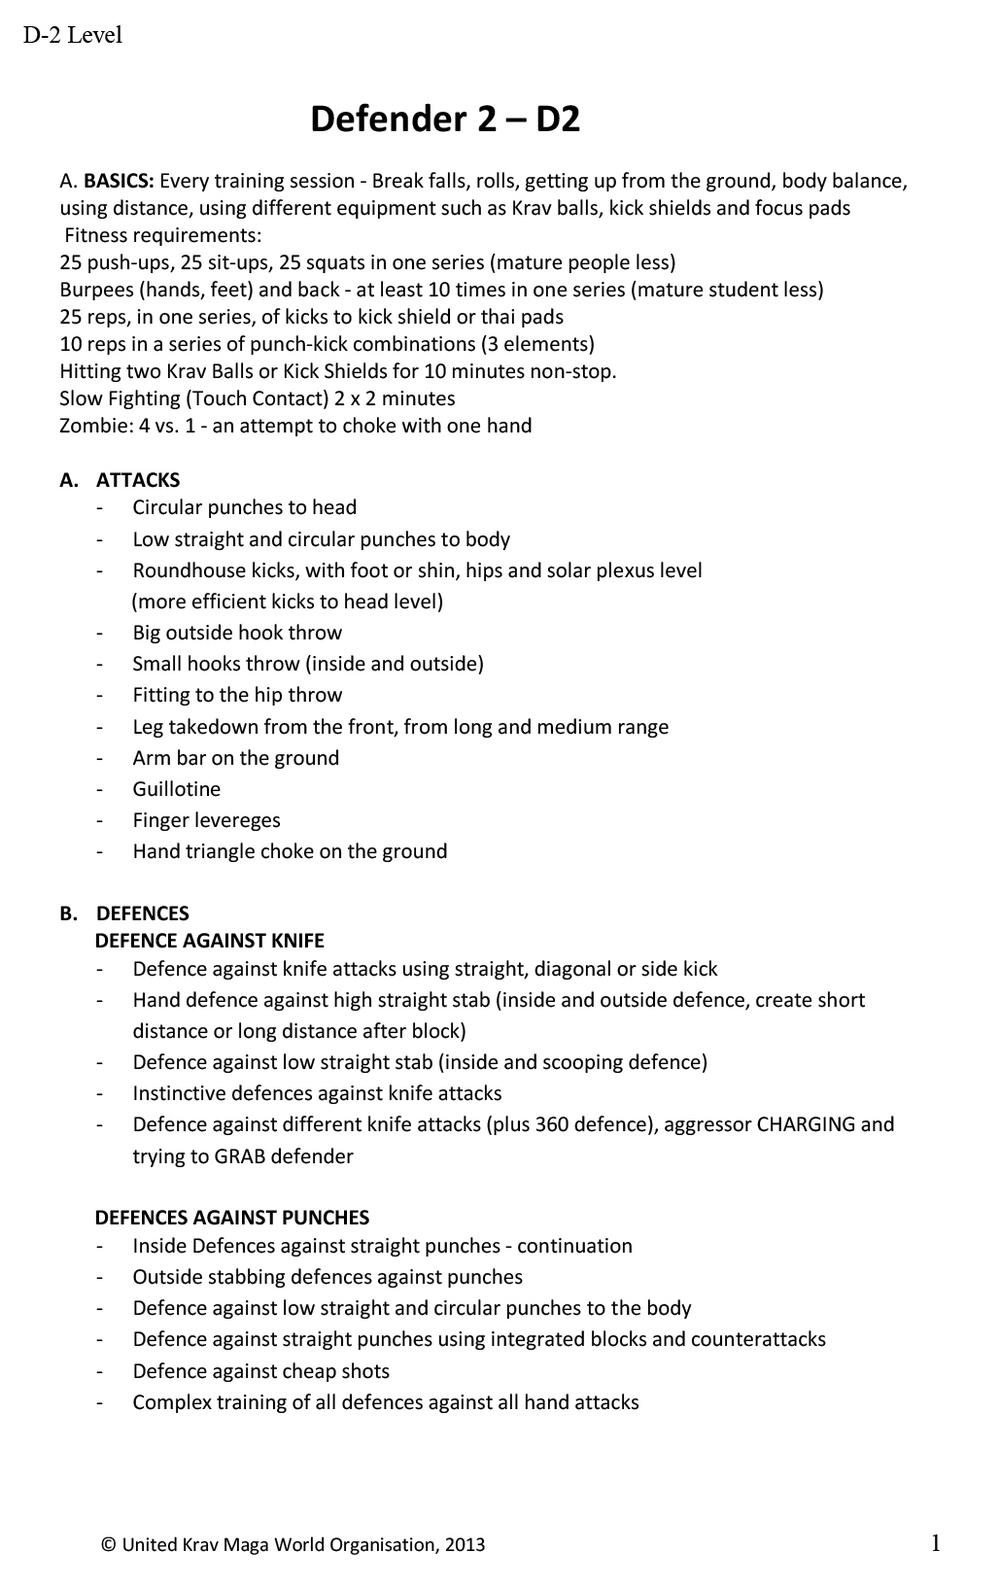 D2_ENGLISH.pdf-1.jpg